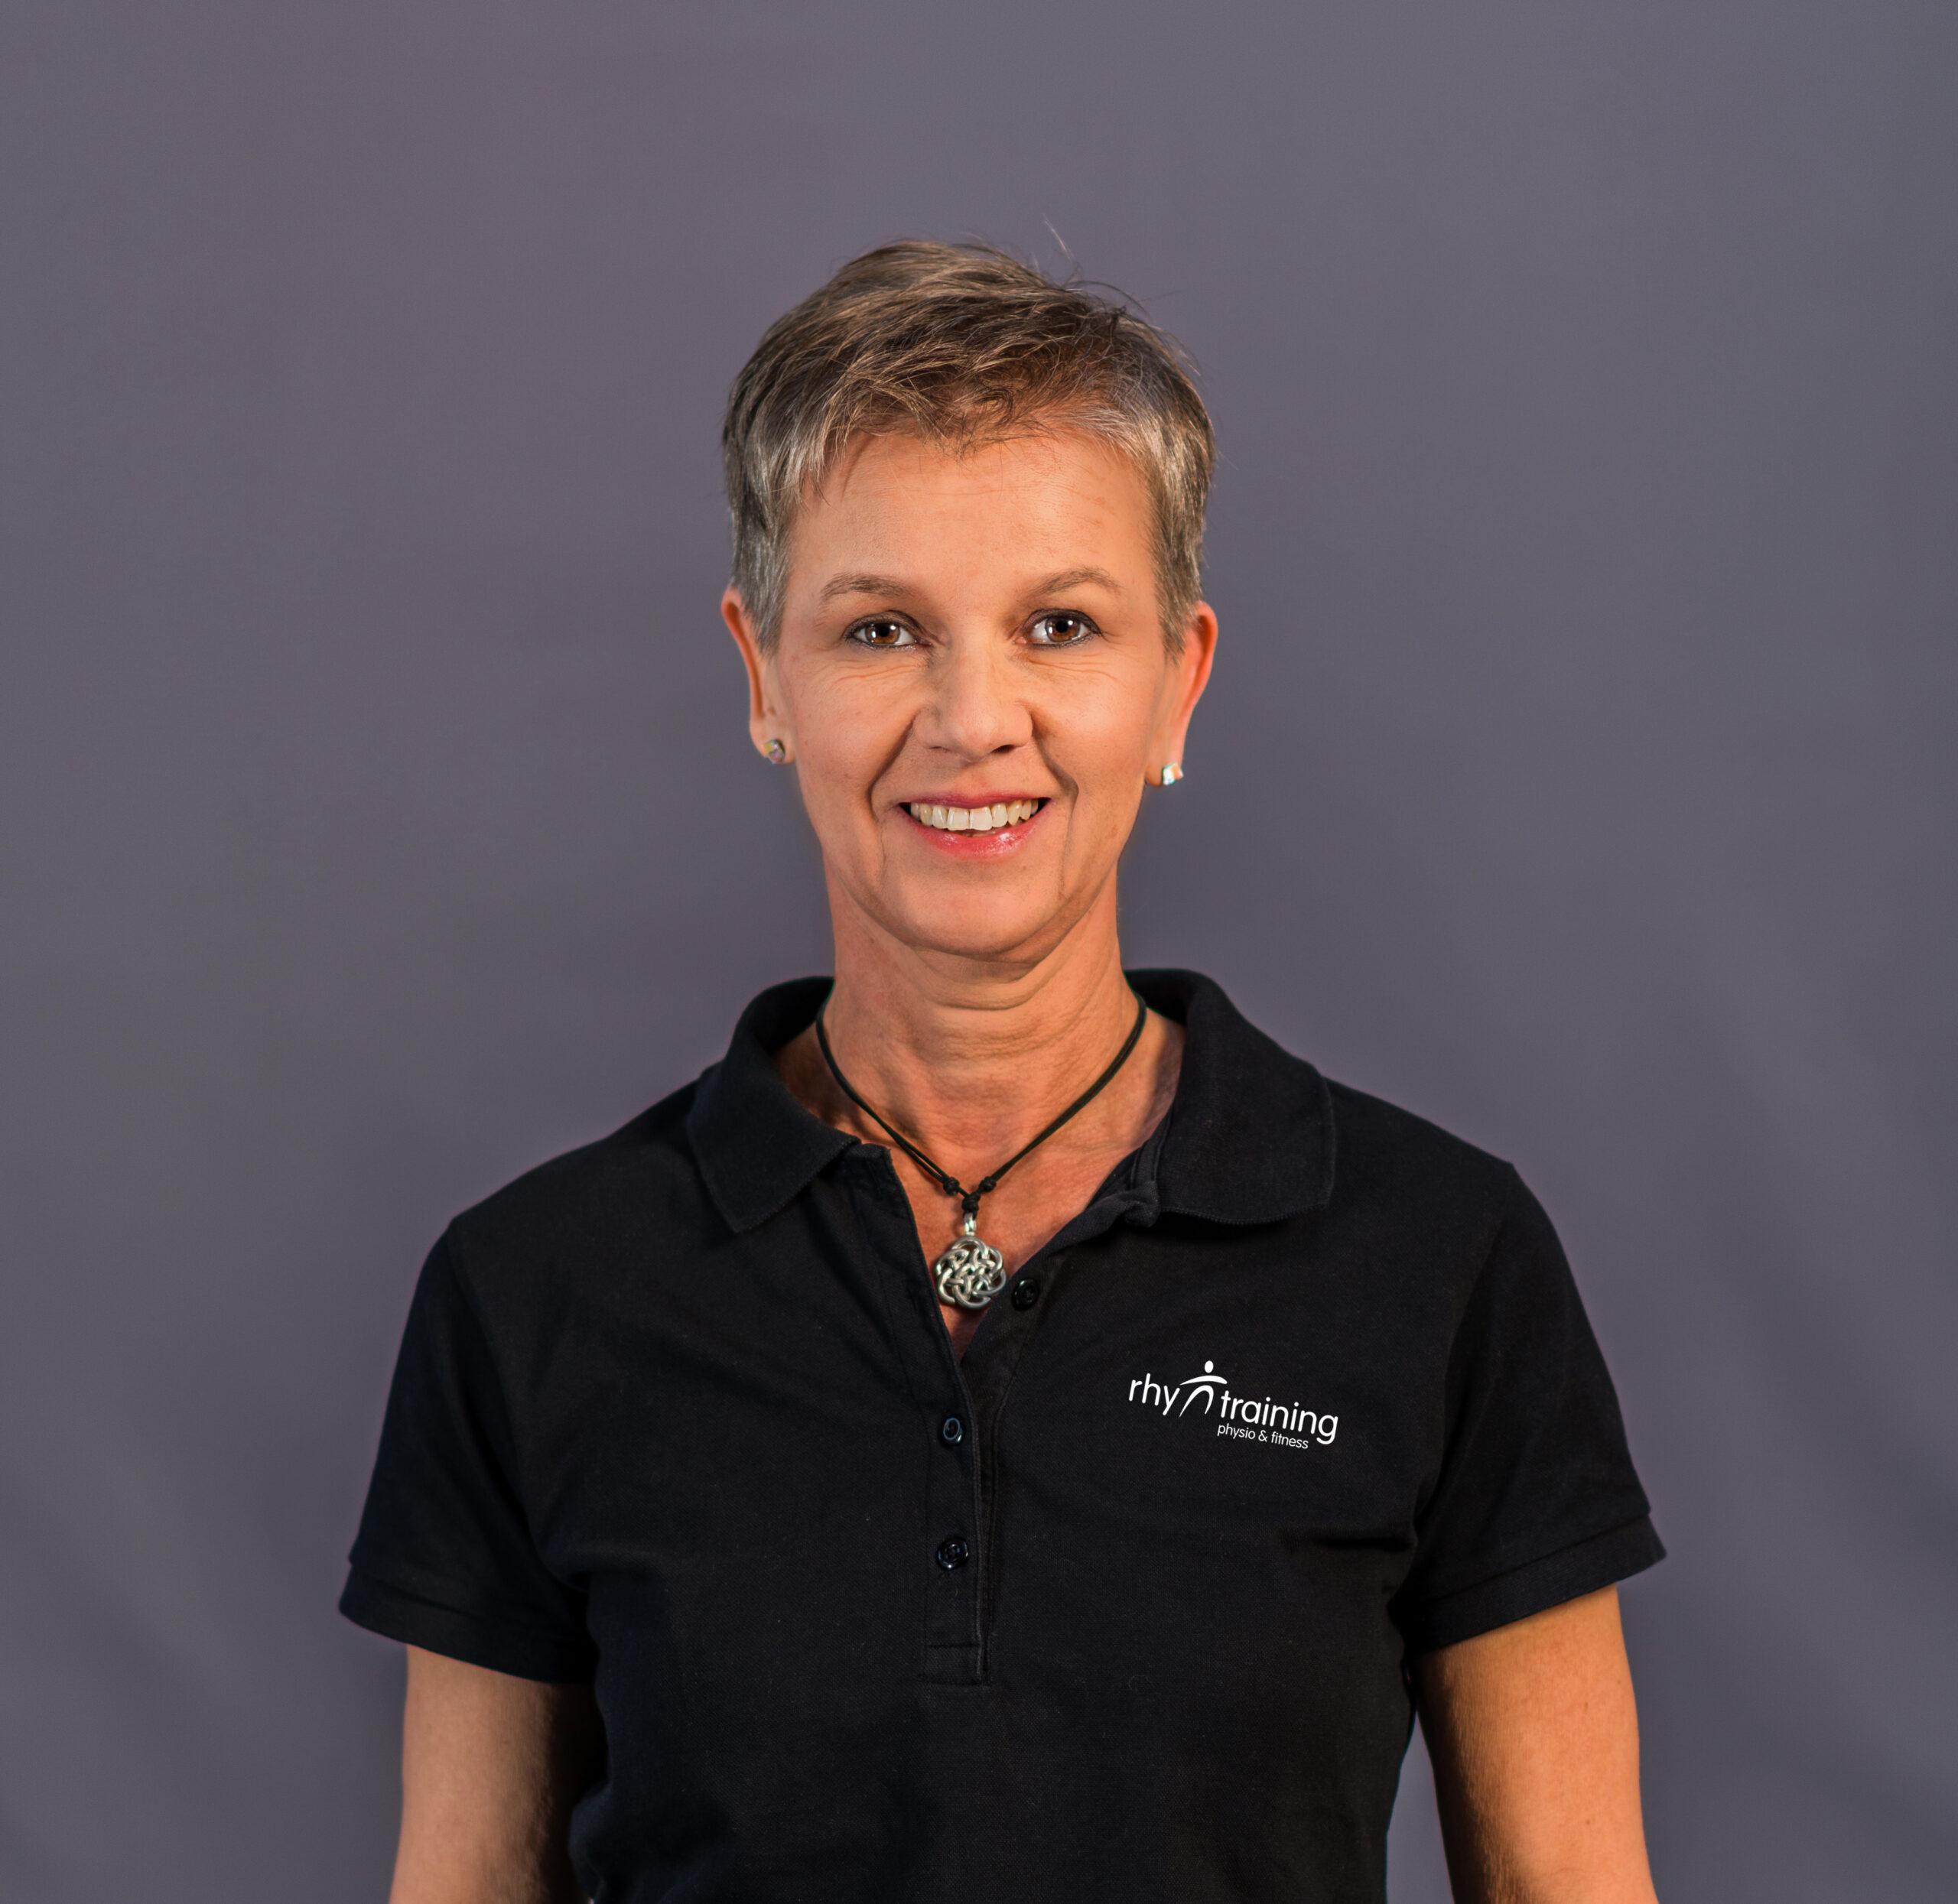 rhytraining – physio & fitness stein am rhein | Irene Kofler